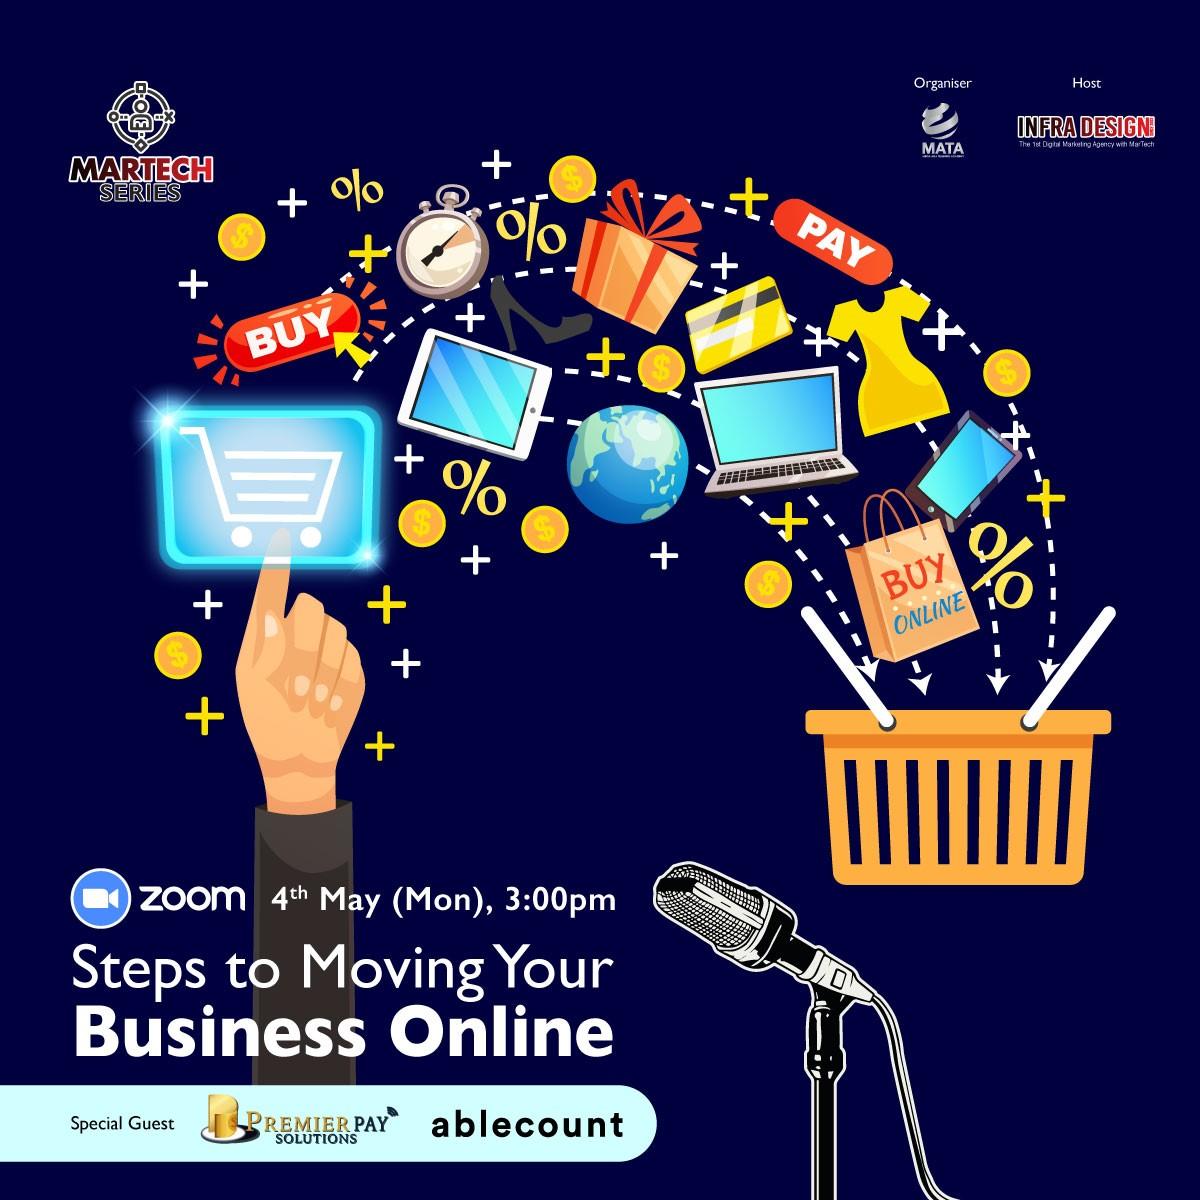 Online Business